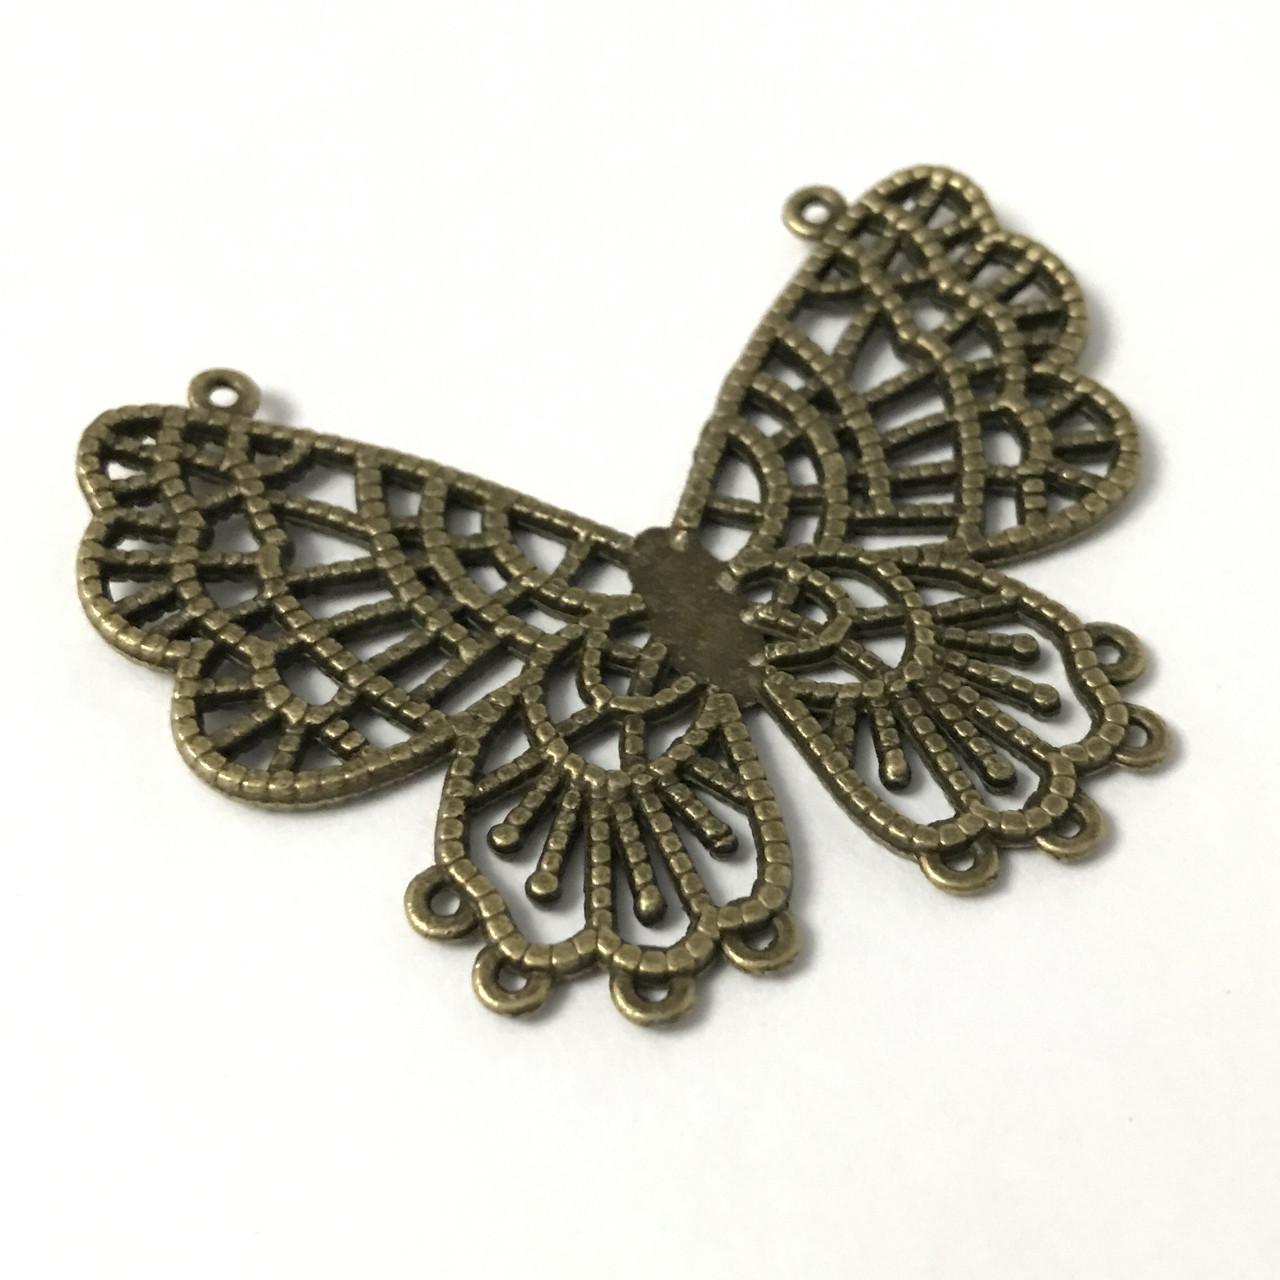 Металеві накладки декор. Метелик. Колір антична бронза. 60х48мм